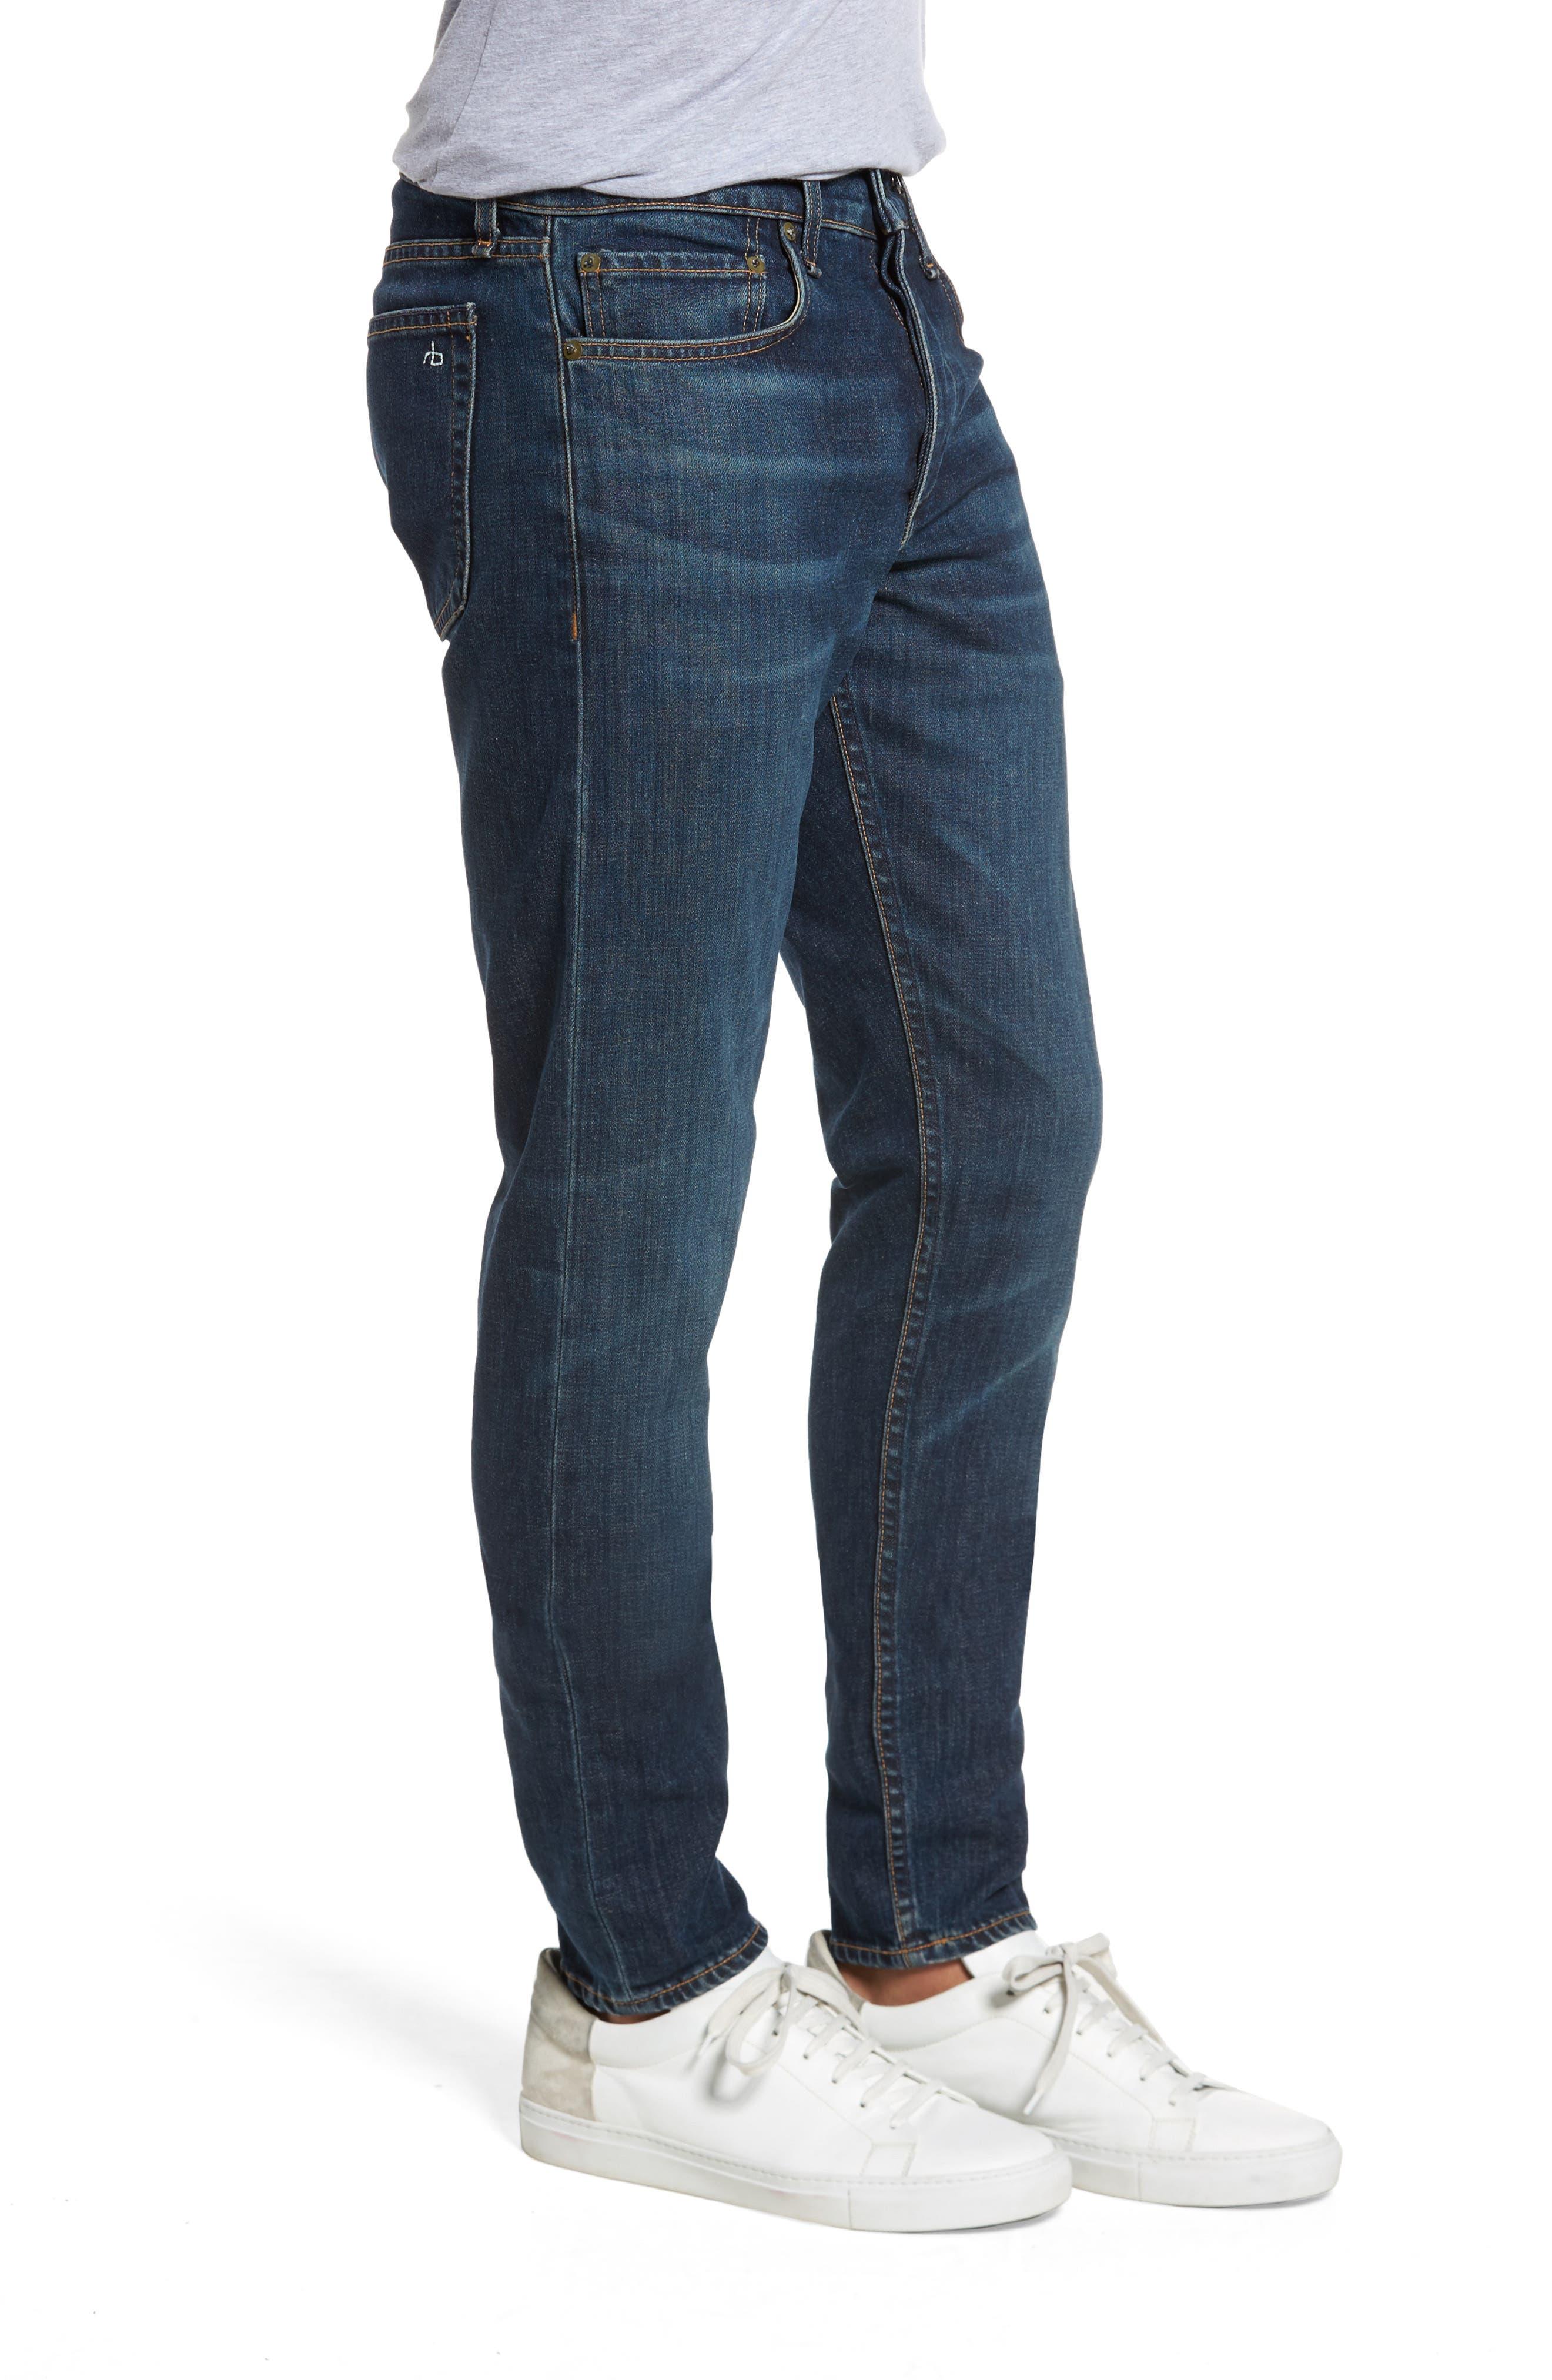 Fit 1 Skinny Fit Jeans,                             Alternate thumbnail 3, color,                             Linden